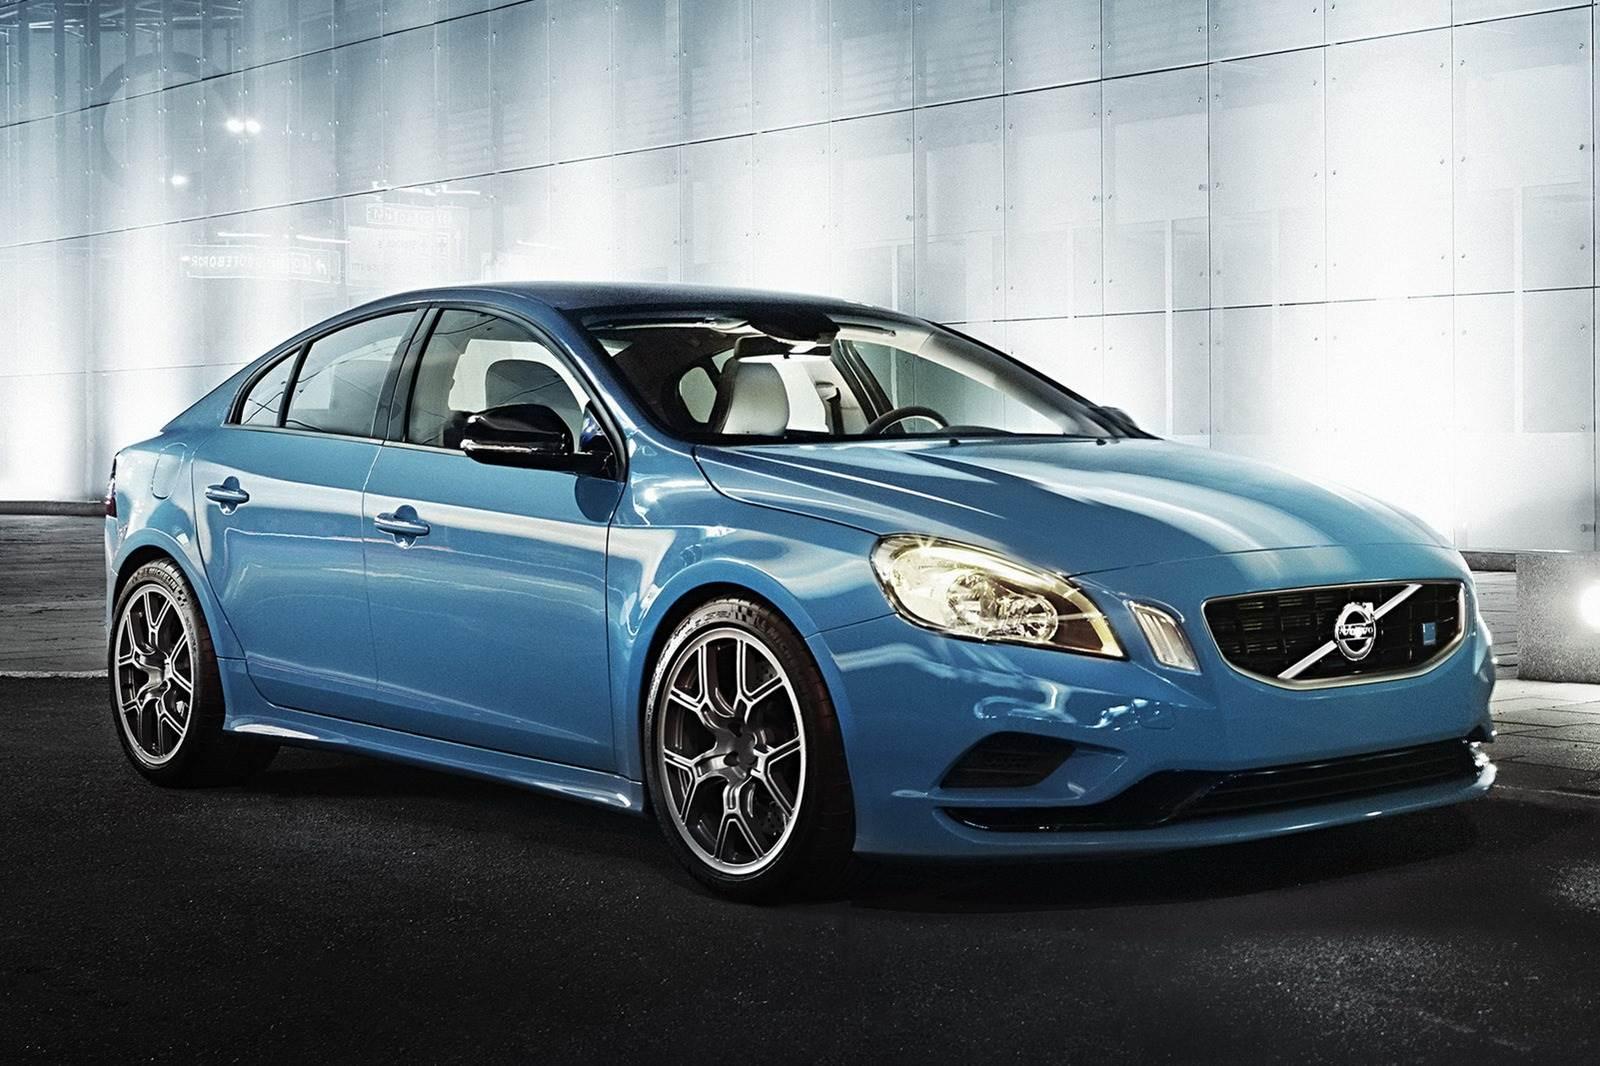 Volvo unveils S60 Polestar concept